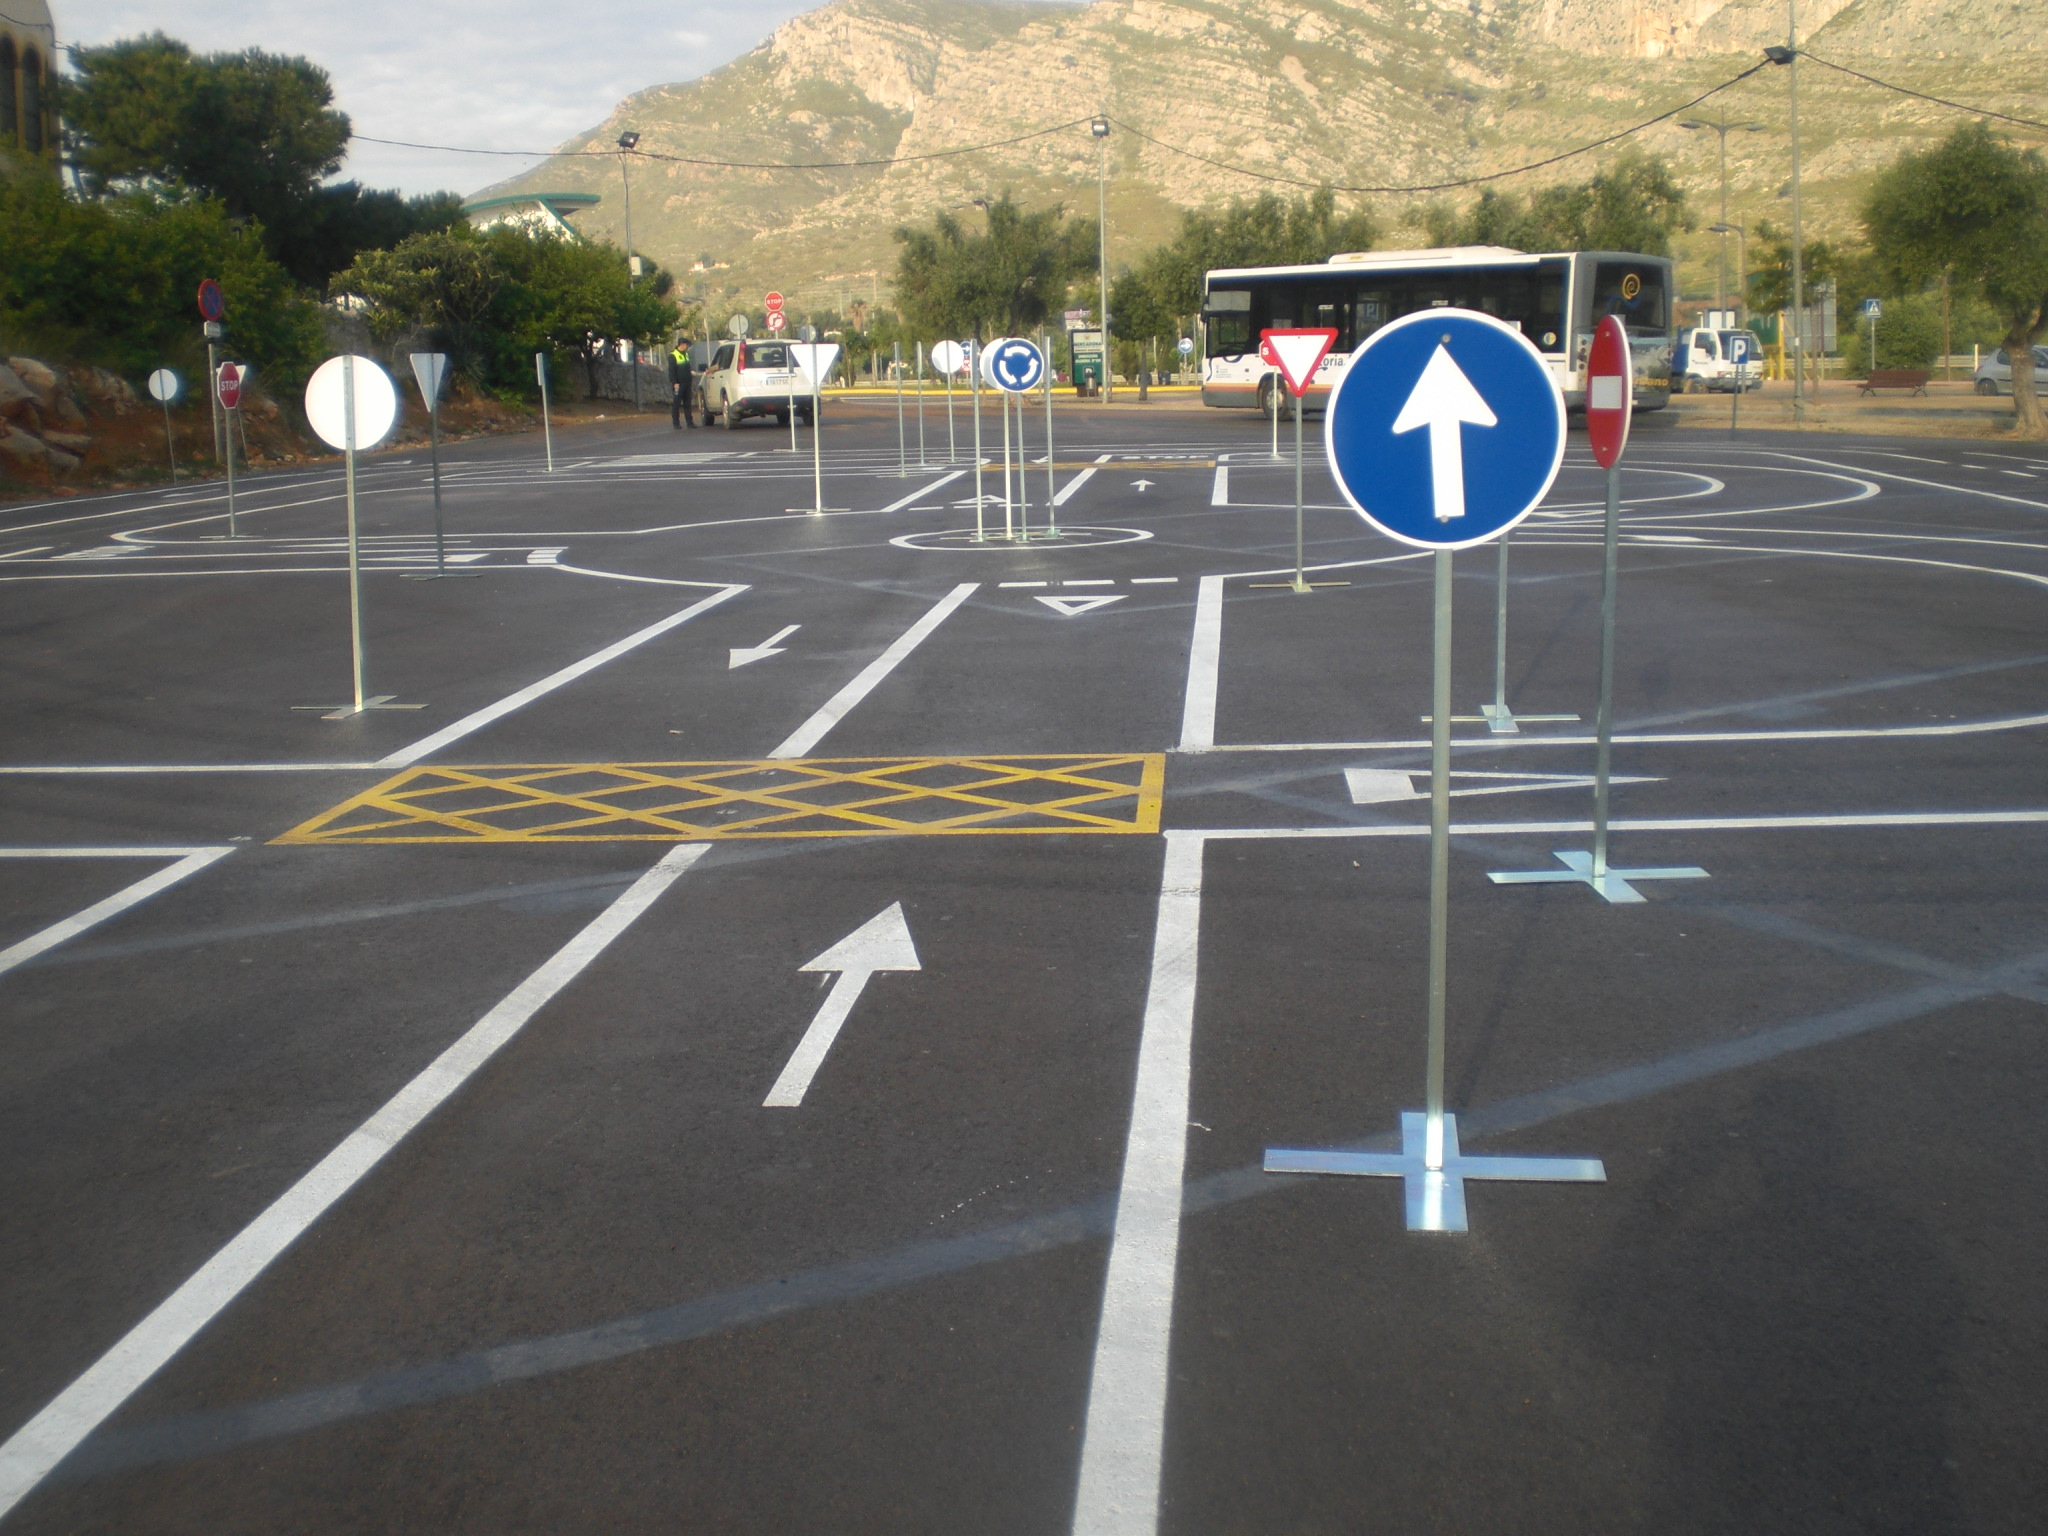 Circuito Vial : Seofer archive parque infantil de tráfico en oropesa